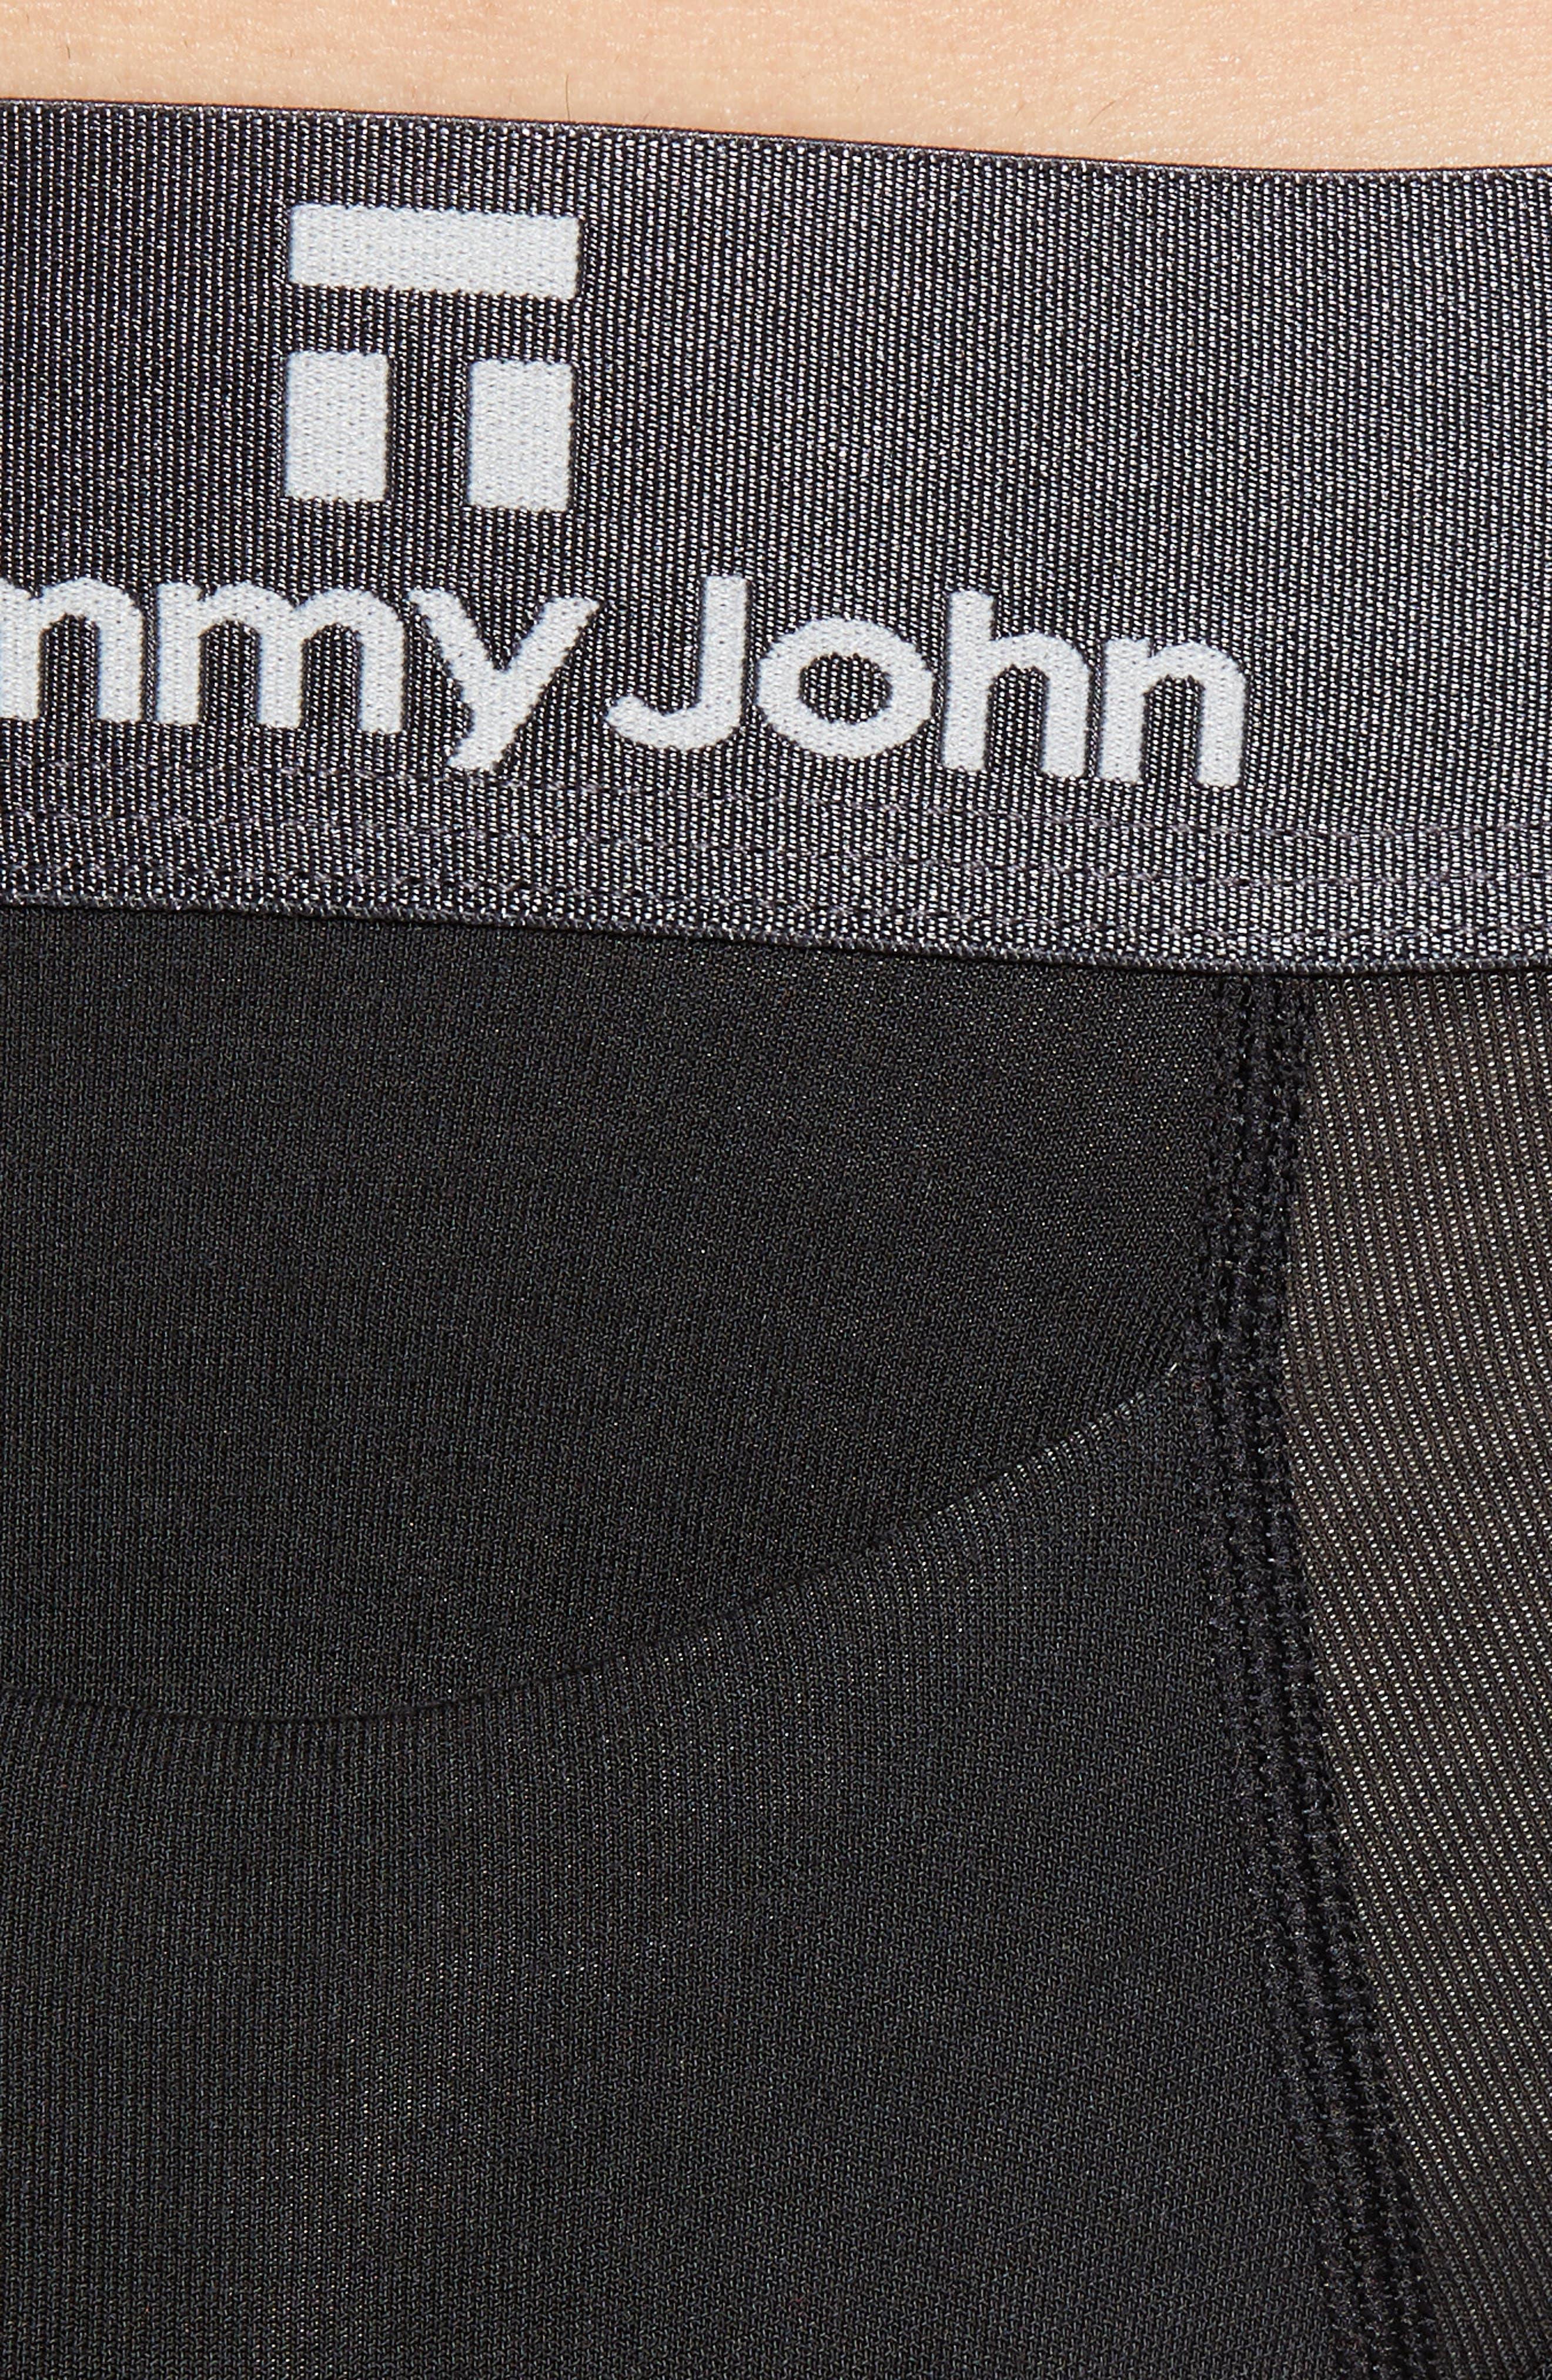 TOMMY JOHN, Second Skin Gunmetal Briefs, Alternate thumbnail 4, color, BLACK